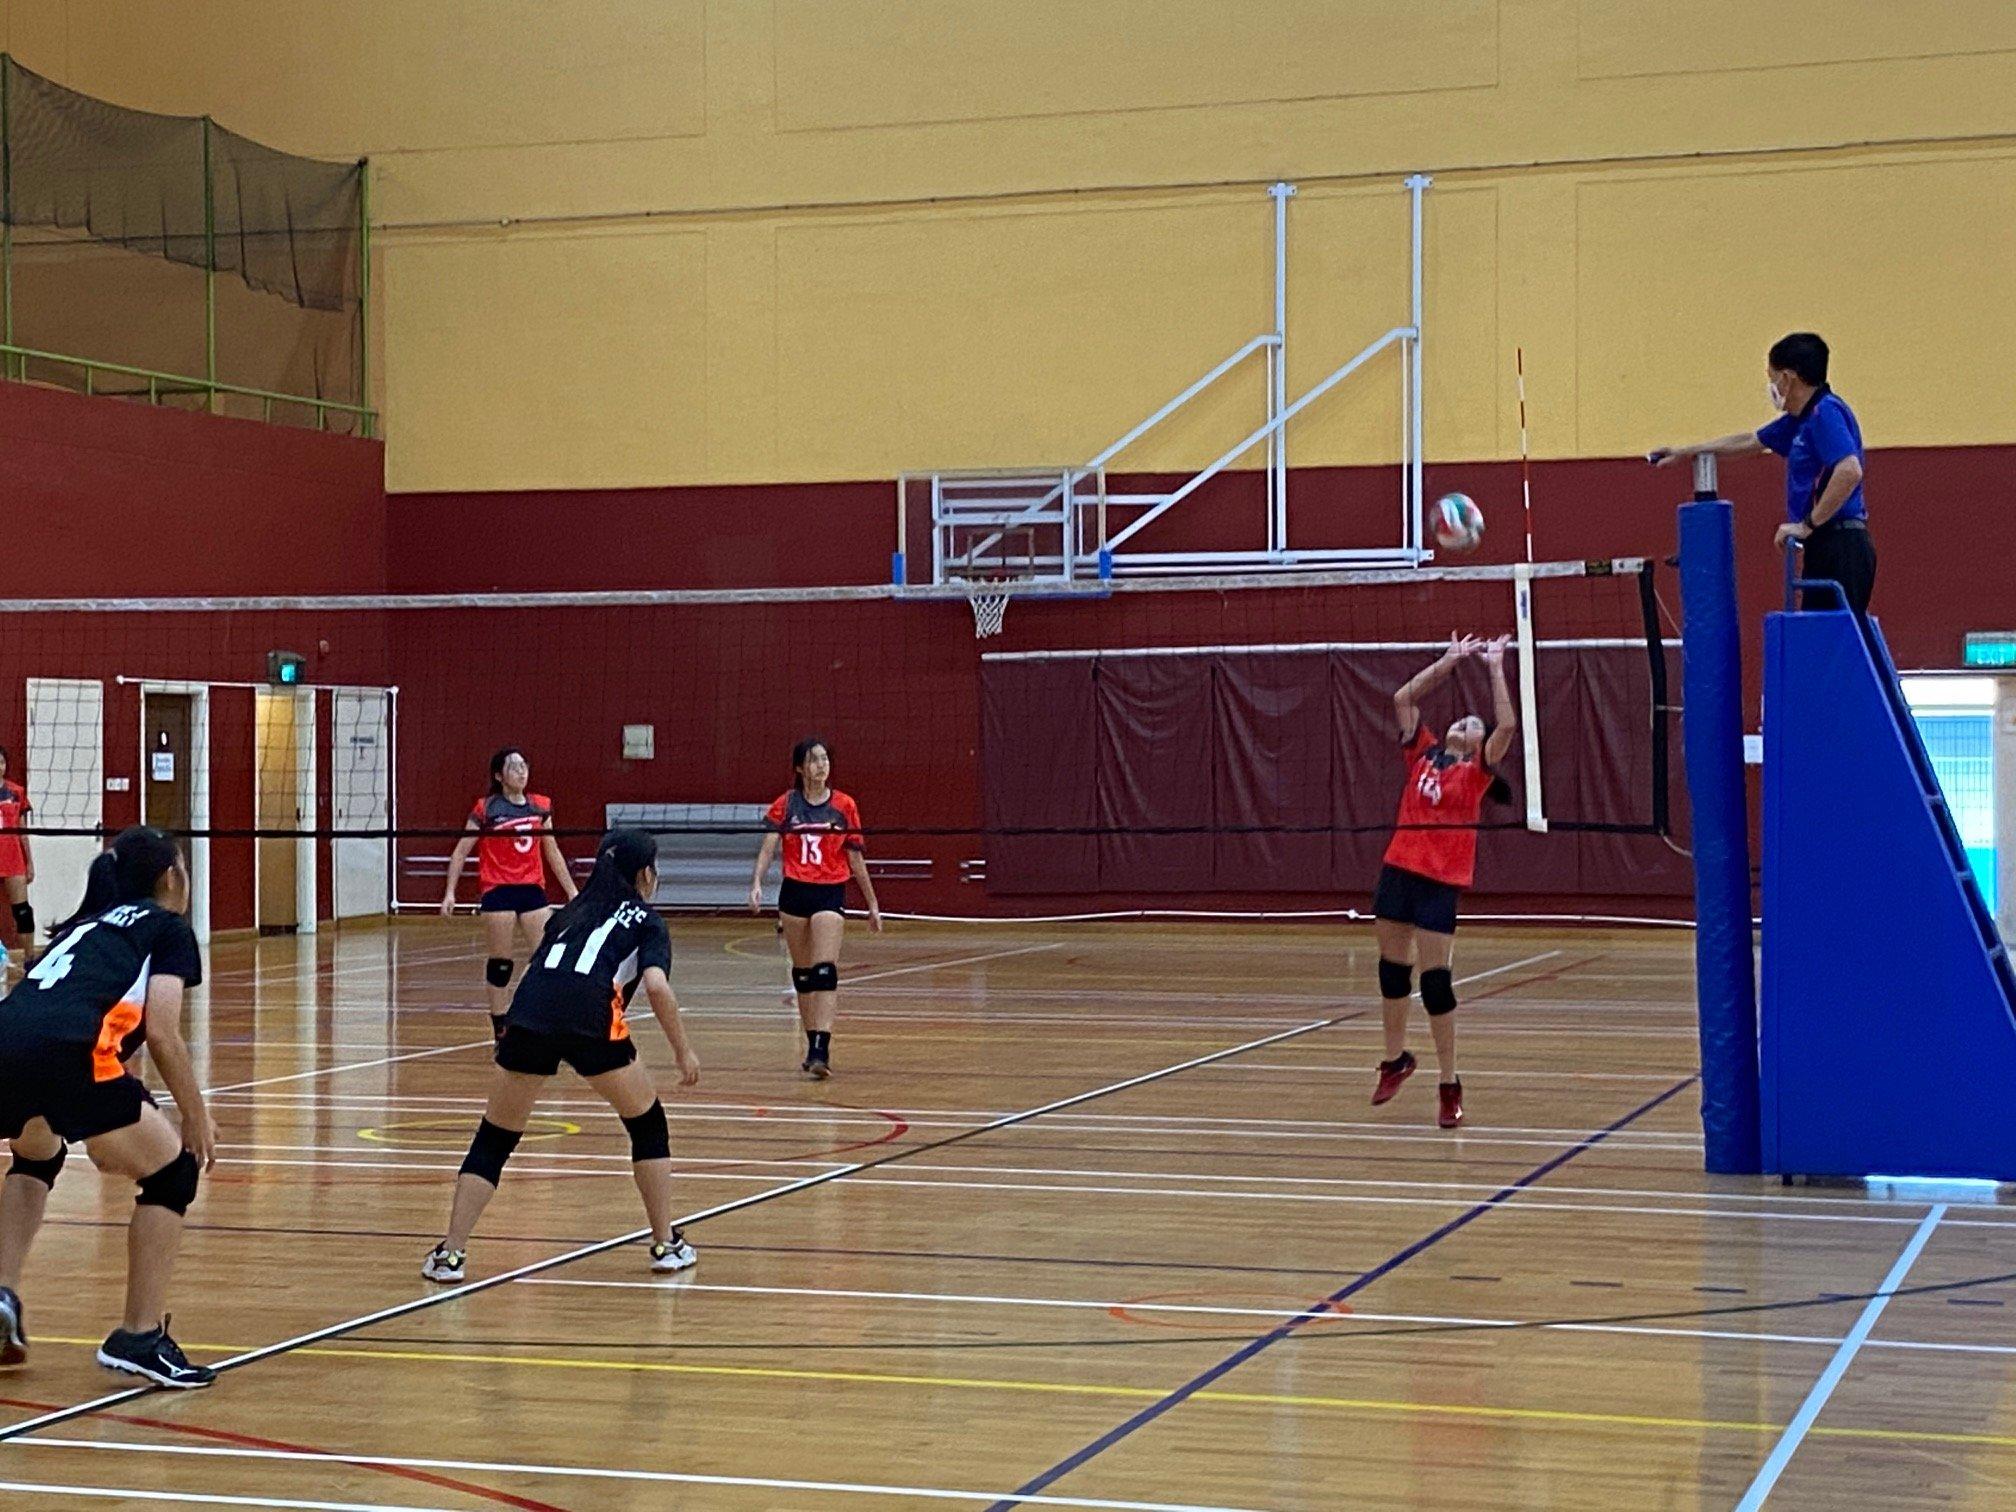 NSG A Div girls' volleyball prelim rd - ACJC (red) vs TJC (black) 7